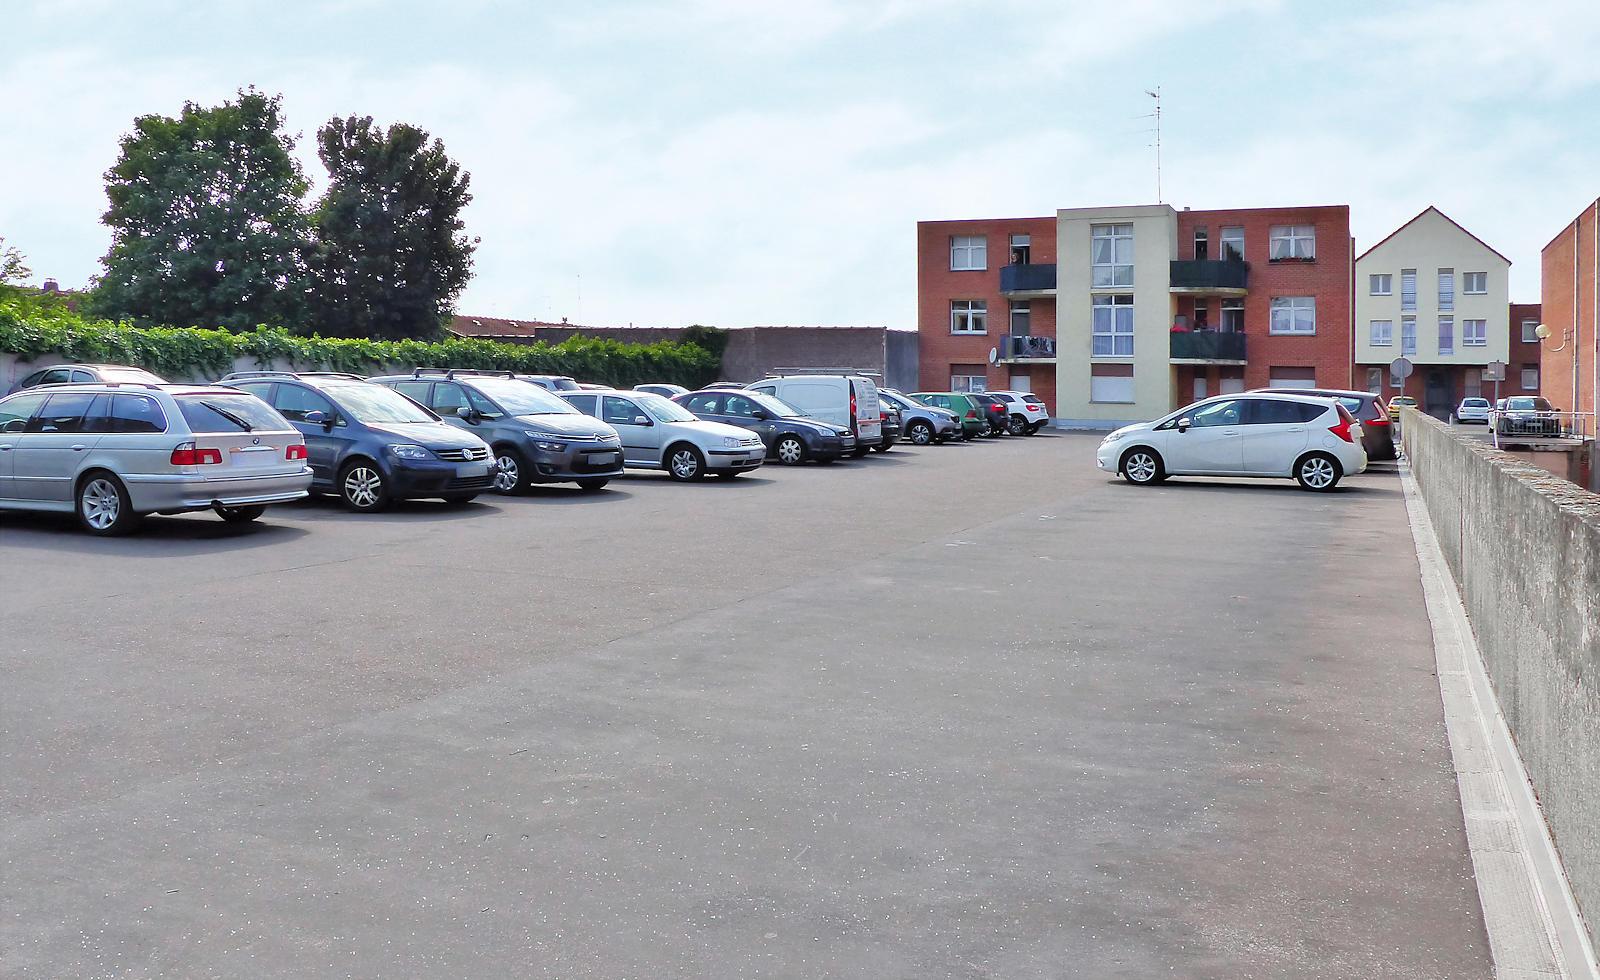 Résidence HLM Marot, Tourcoing - Parking